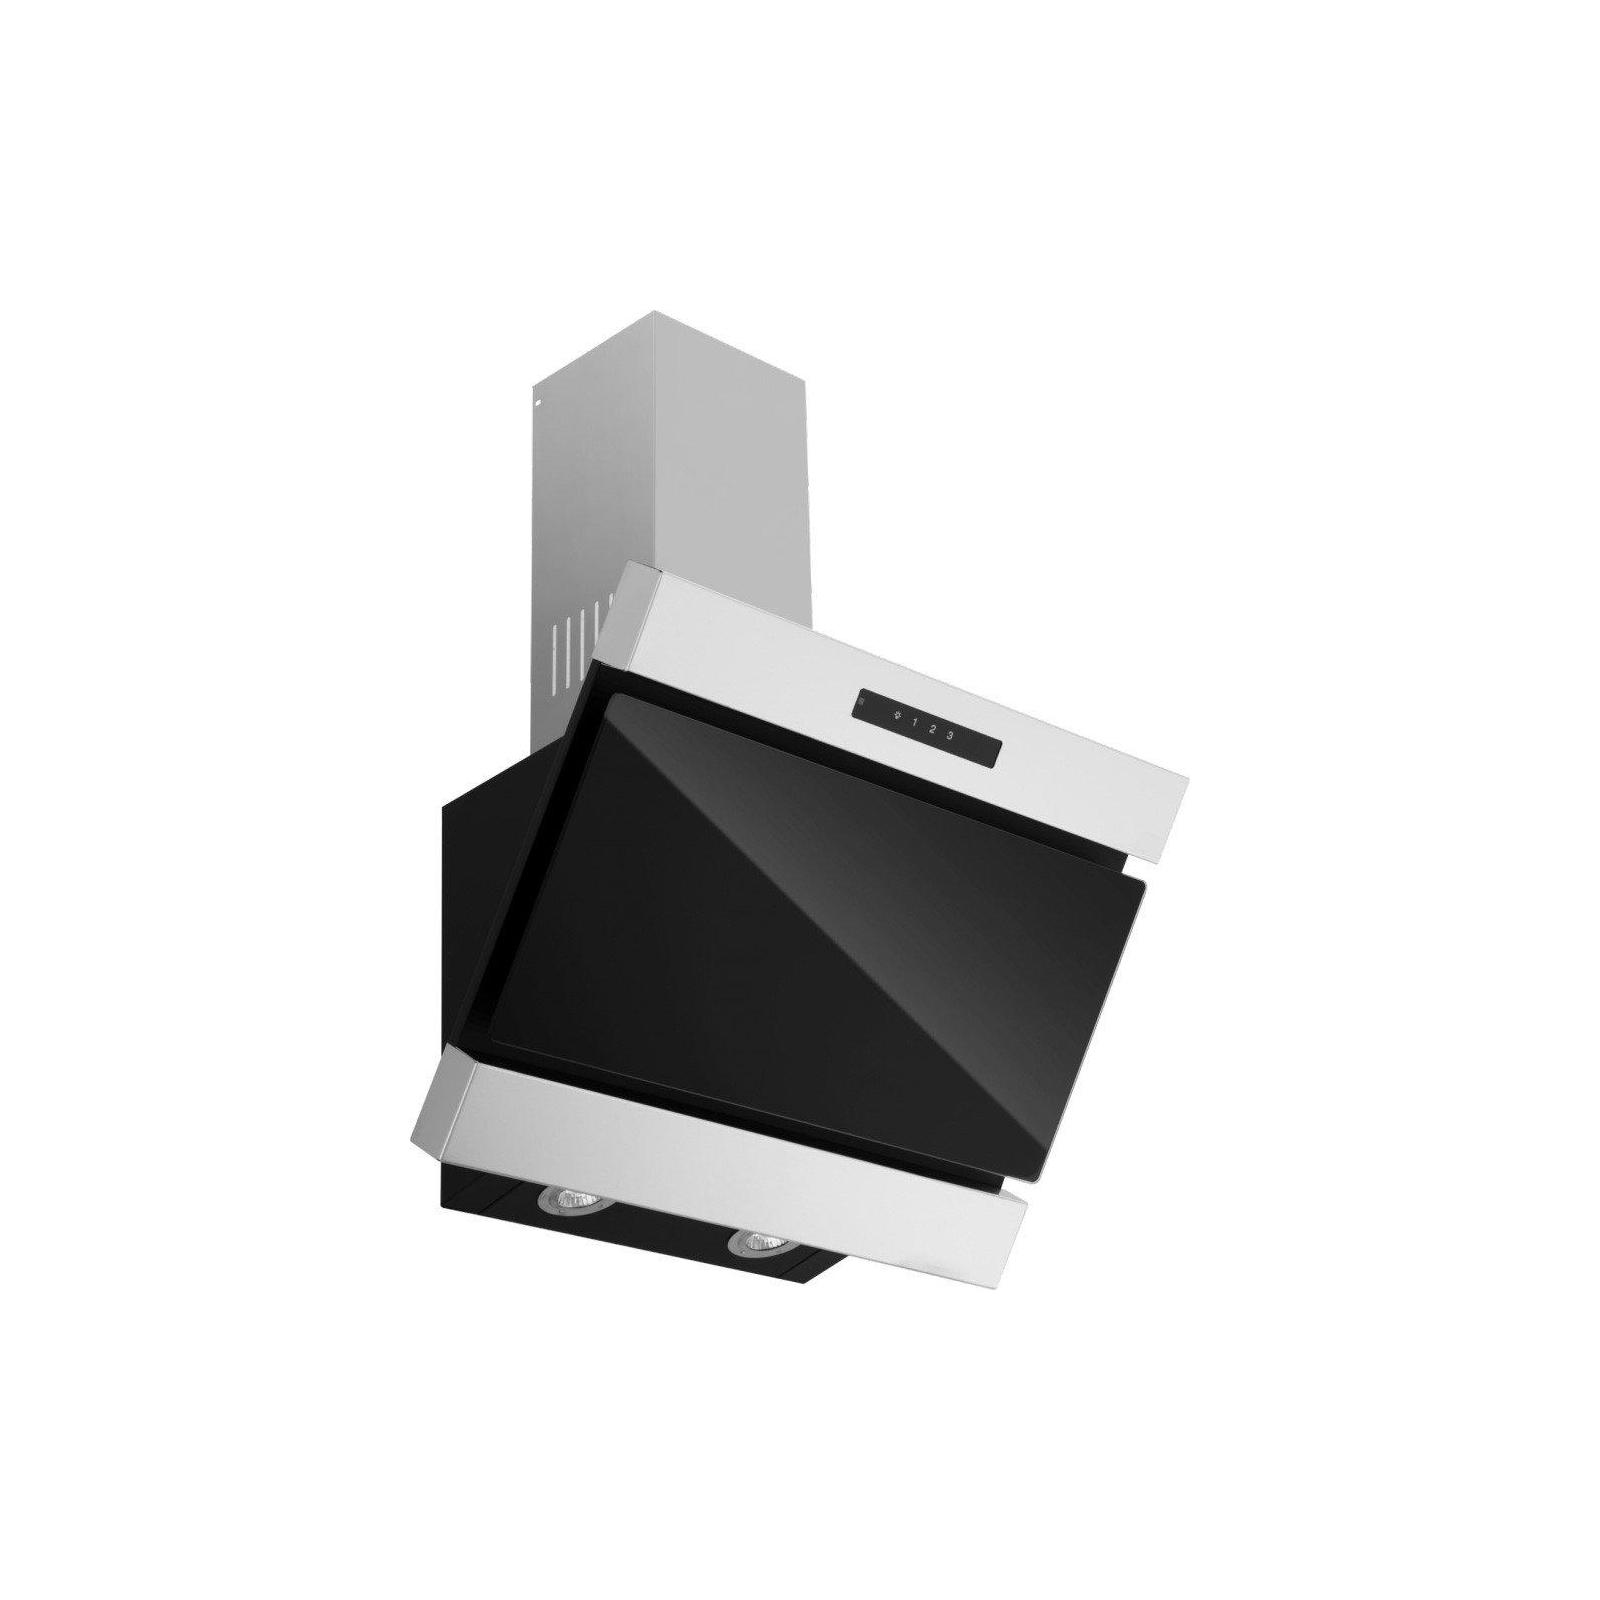 Вытяжка кухонная ZIRTAL FORTE 60 BL